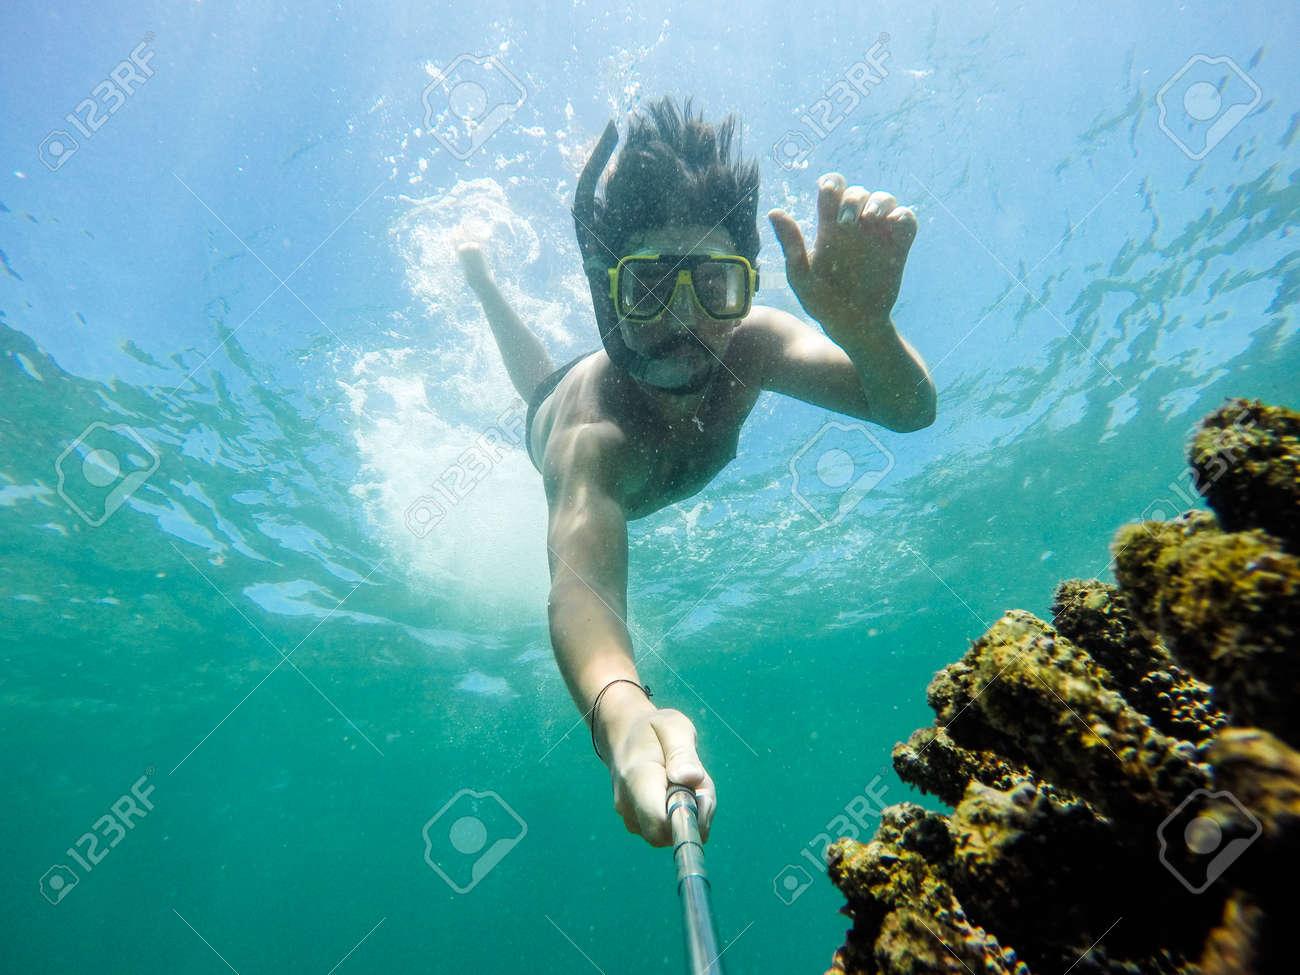 Underwater selfie shot with selfie stick. Deep blue sea. Wide angle shot. - 72142479